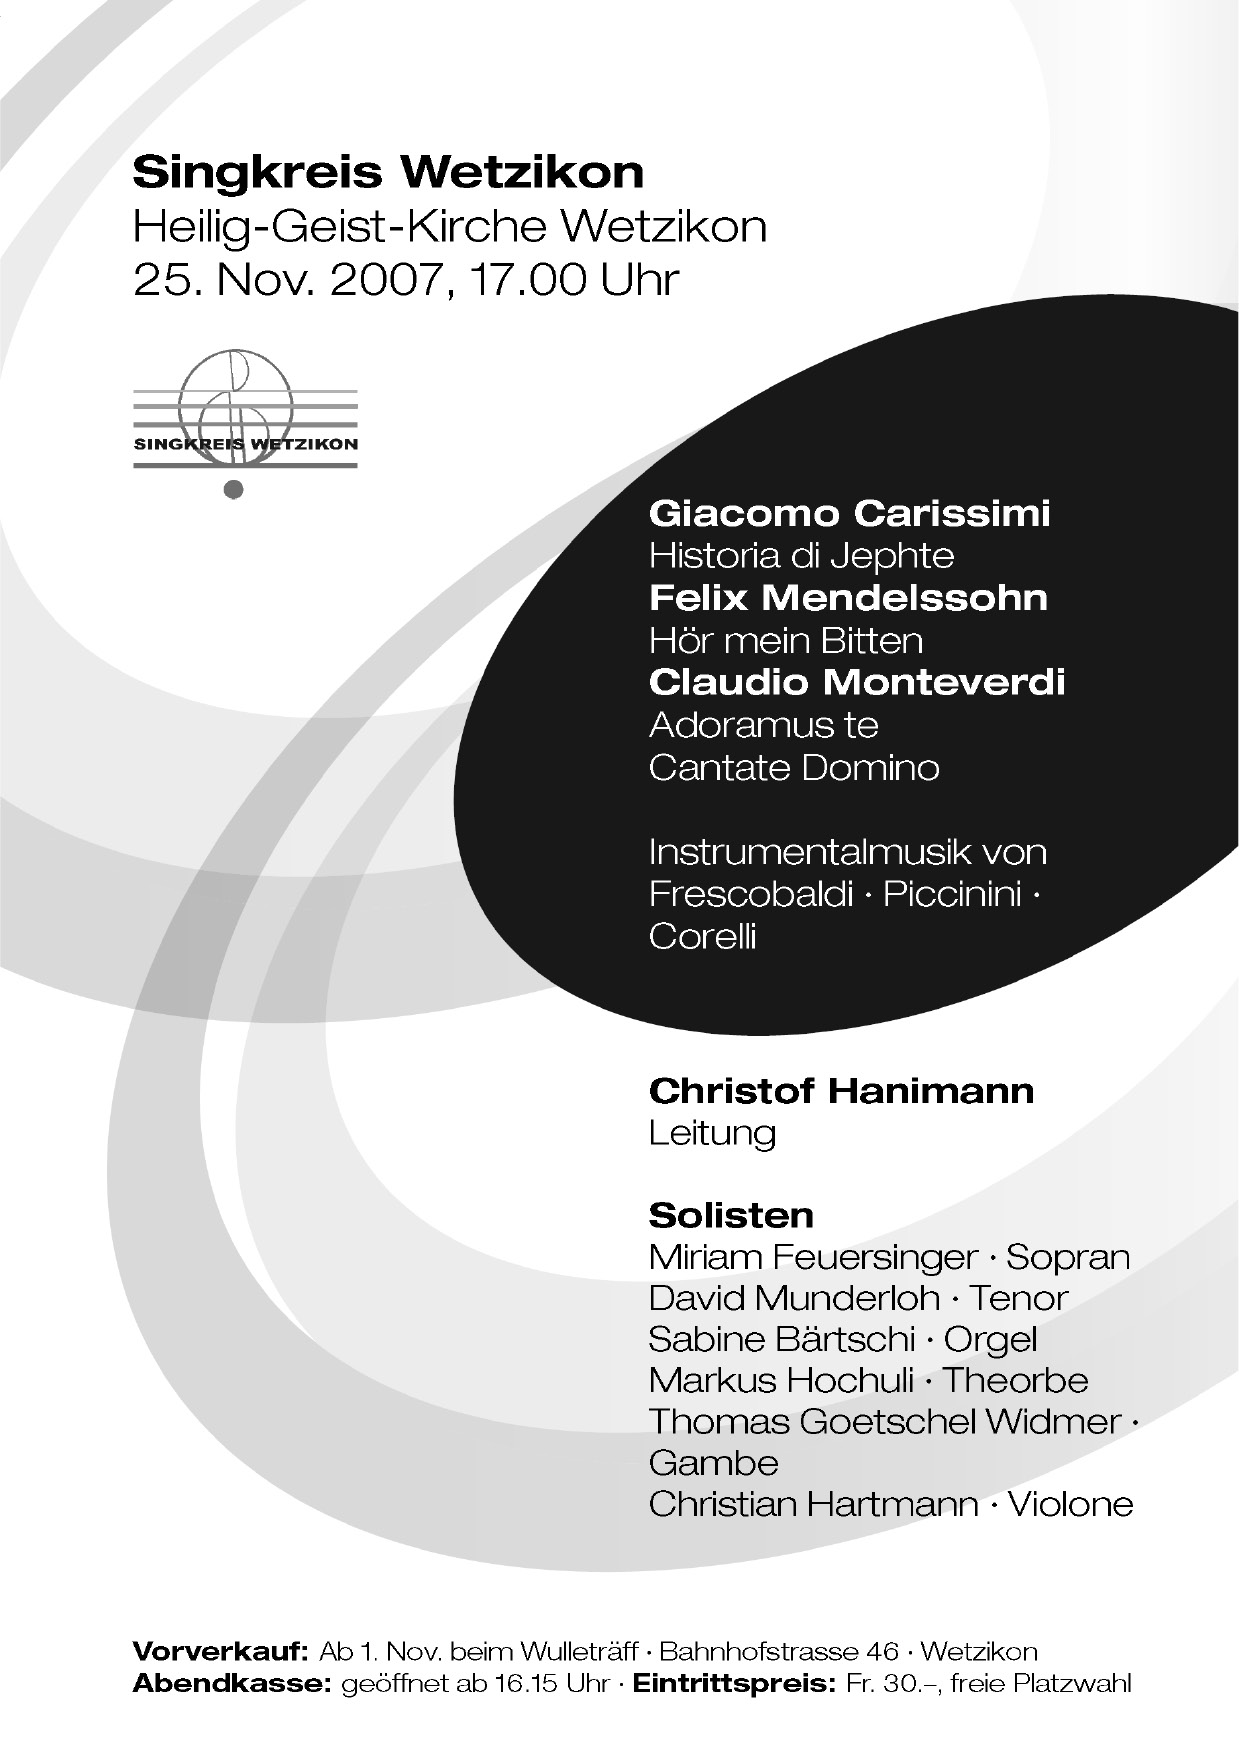 2007 Carissimi, Mendelssohn, Monteverdi